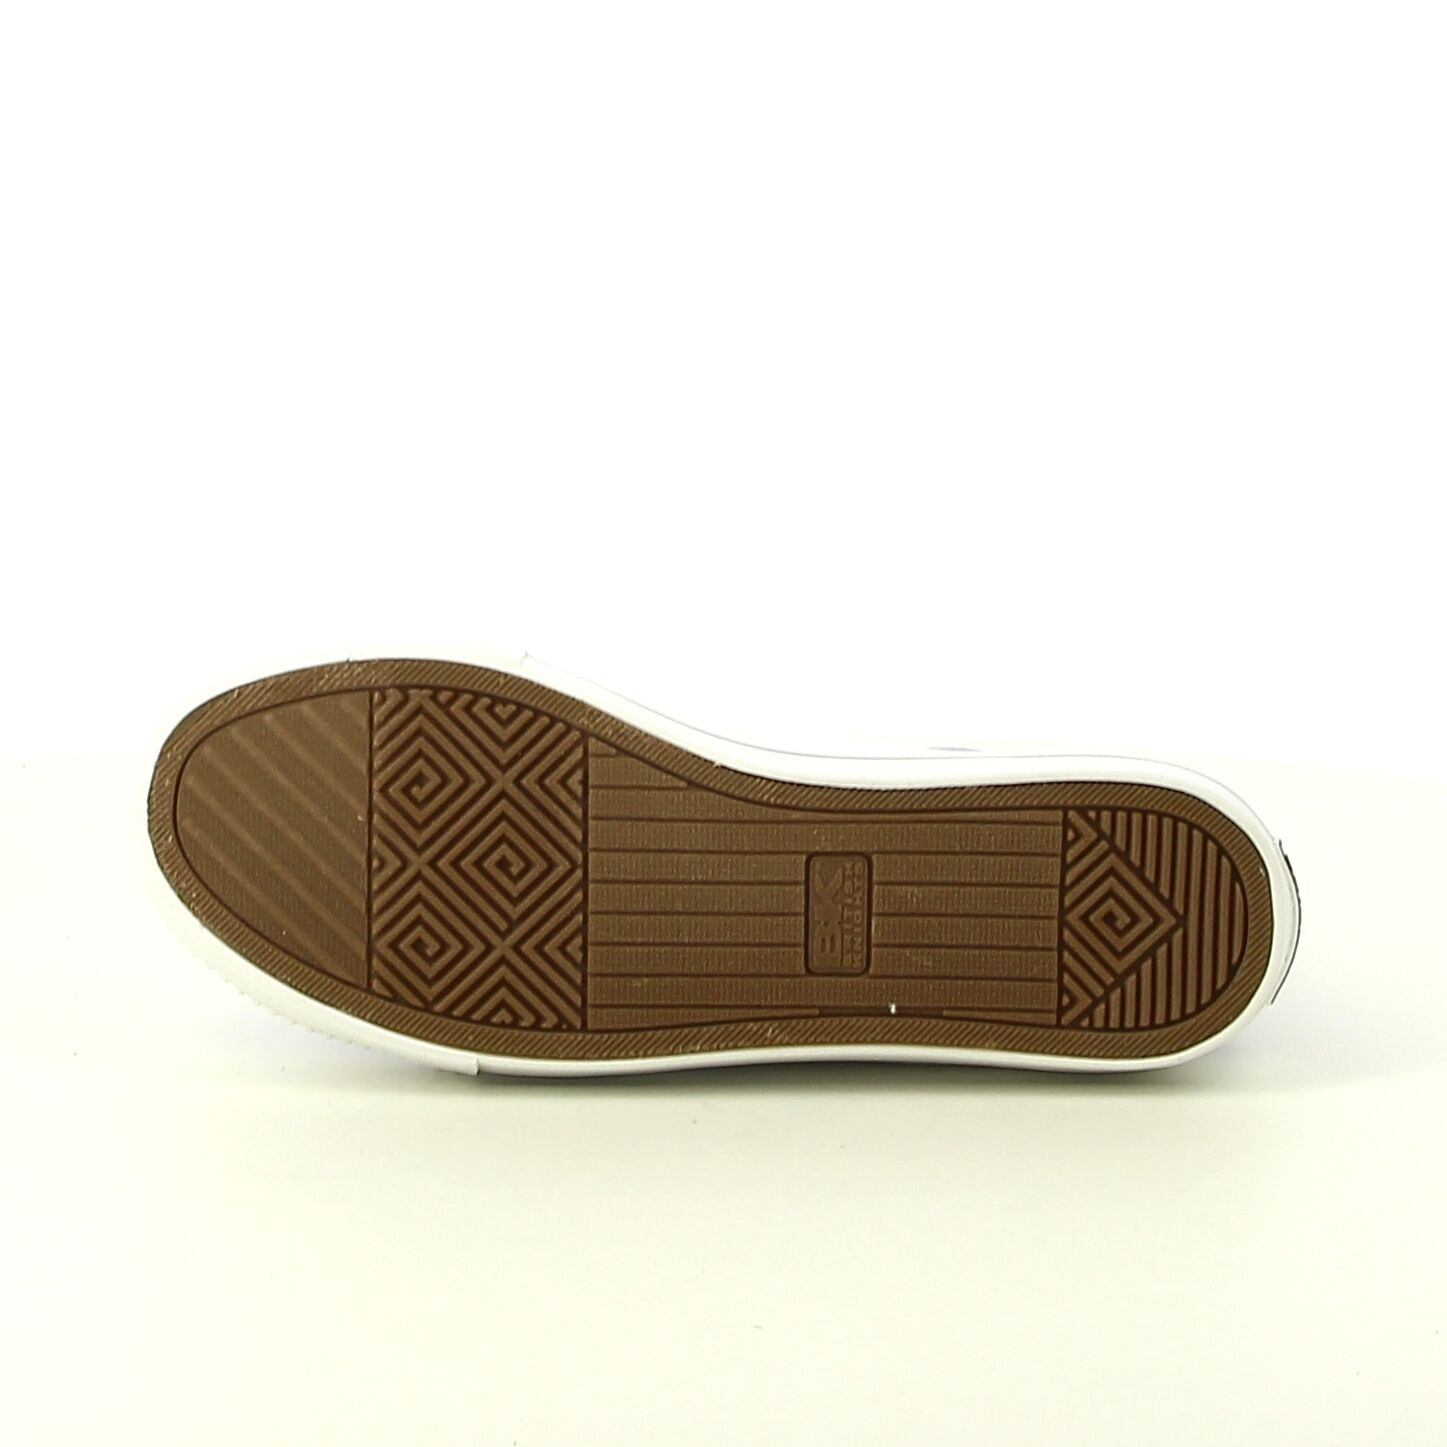 BK - Blauw - Sneakers